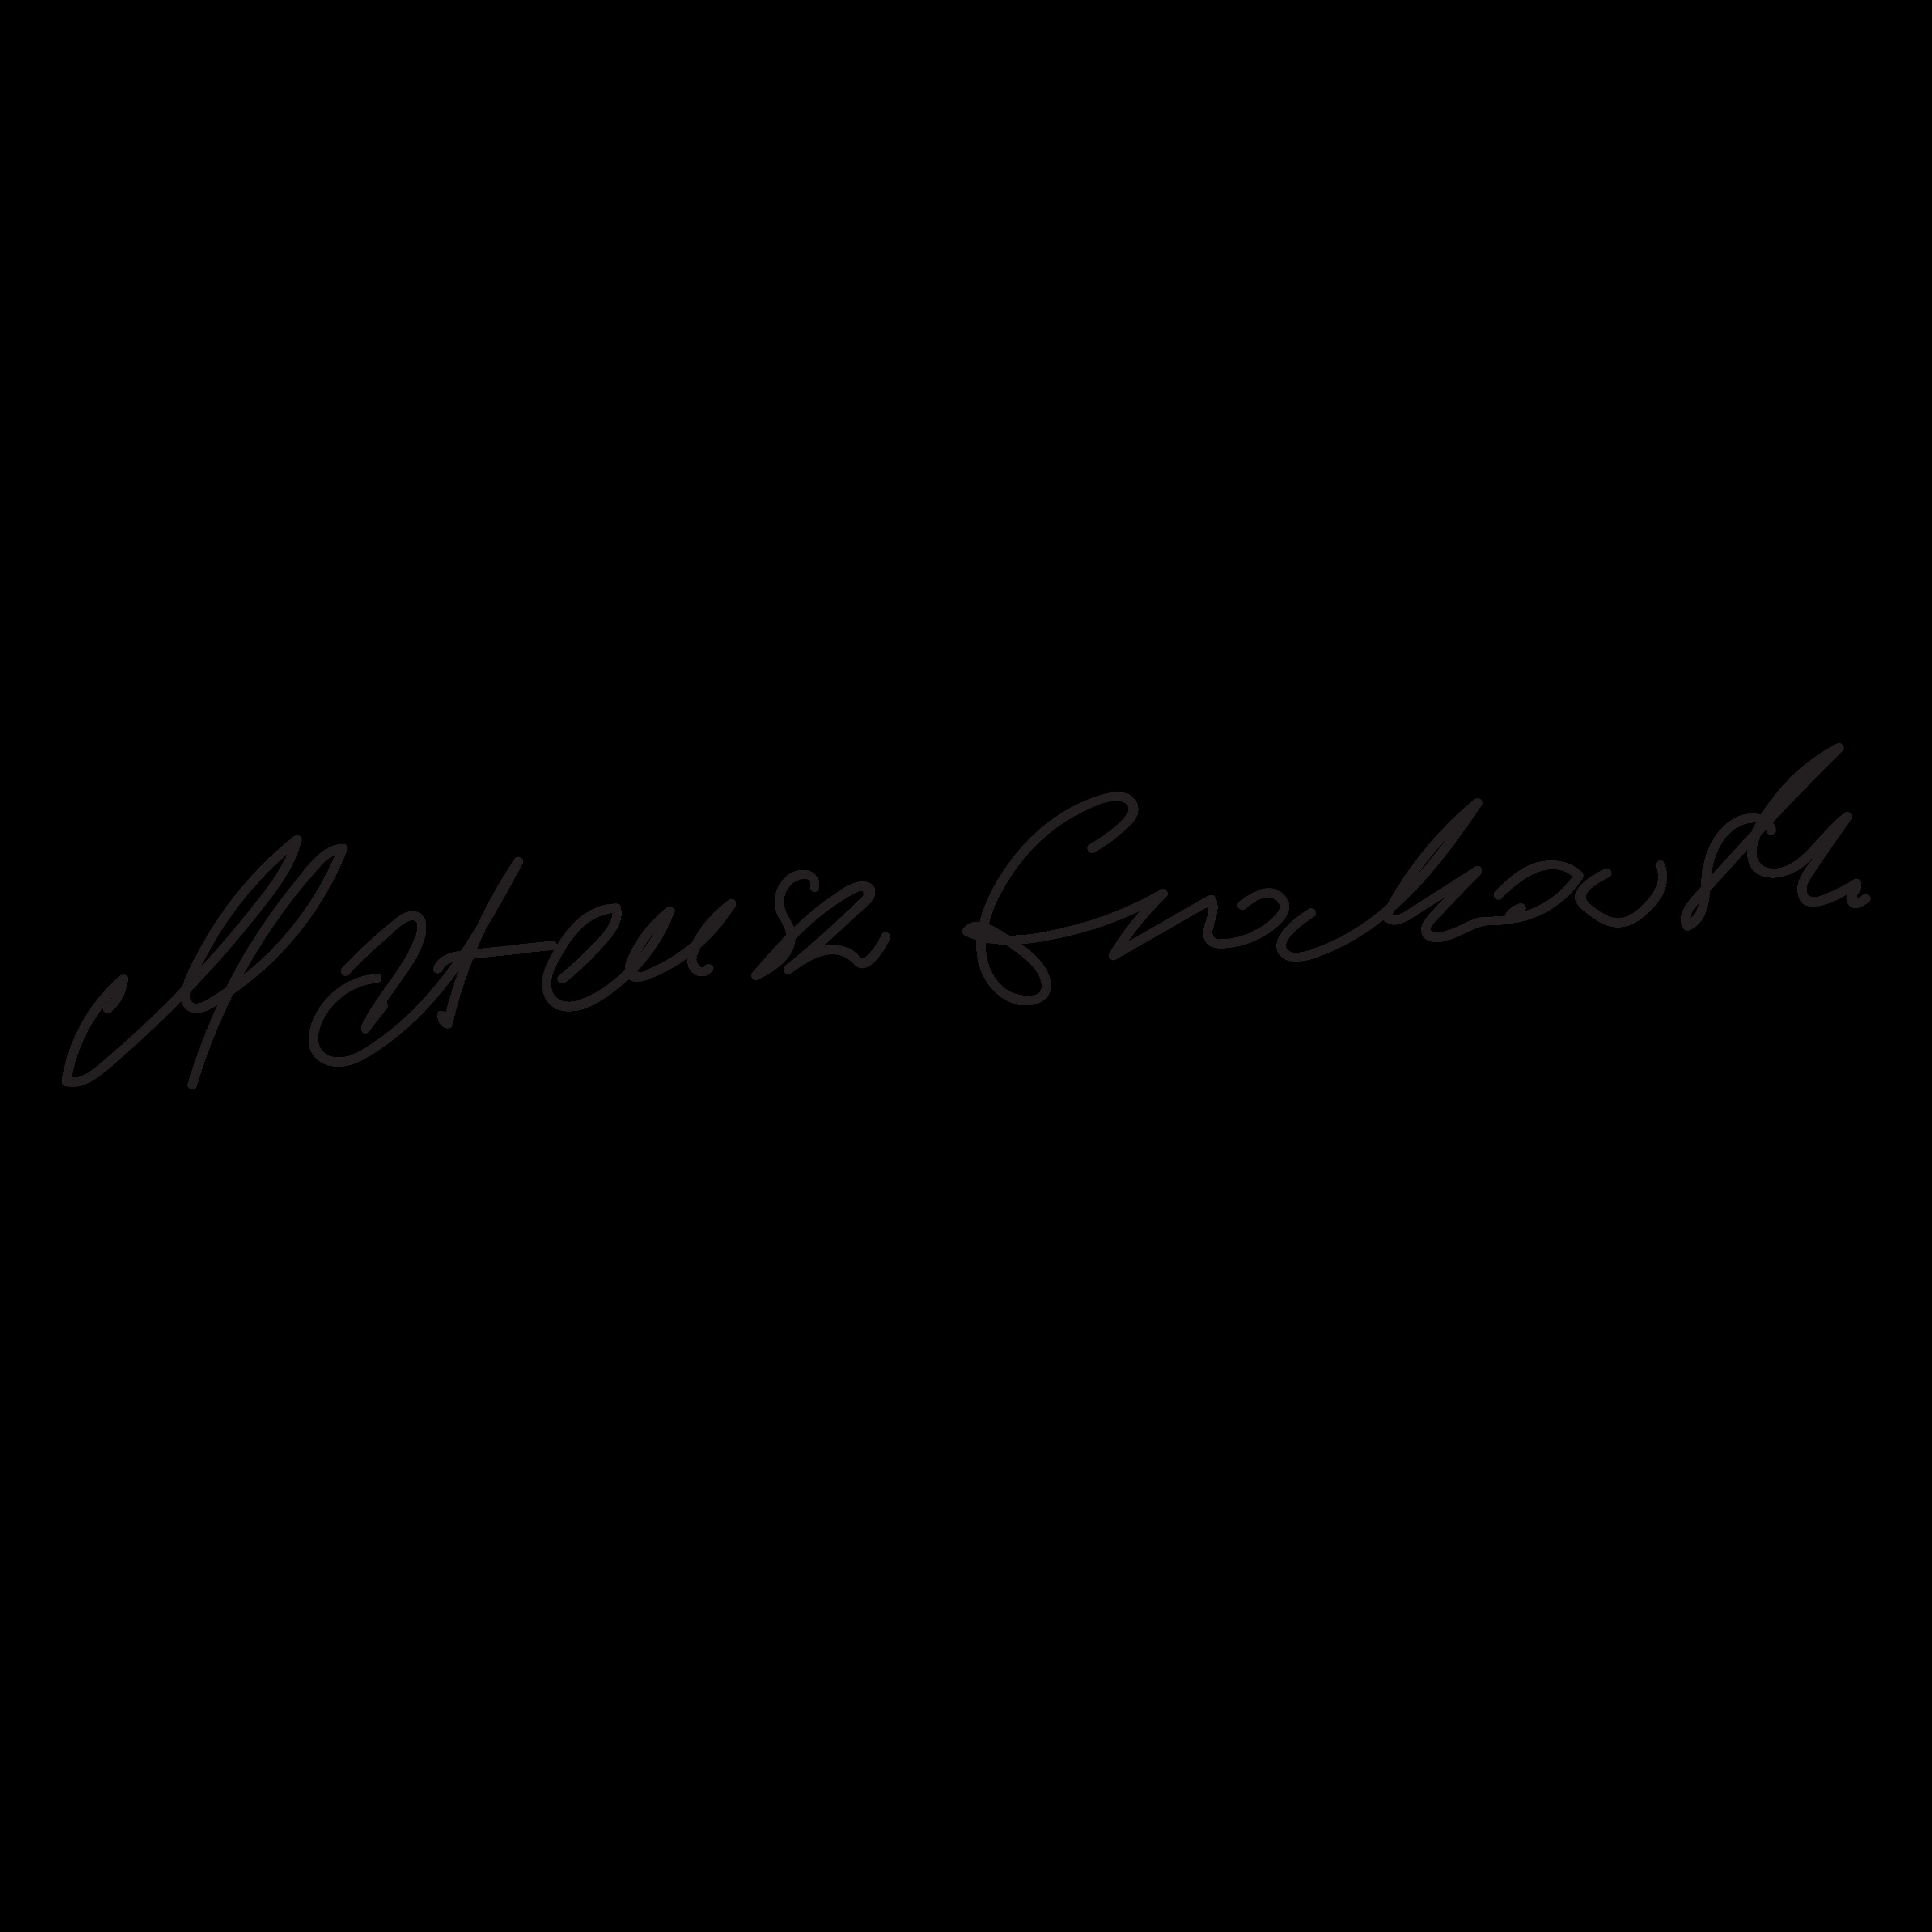 Mateusz Grochowski